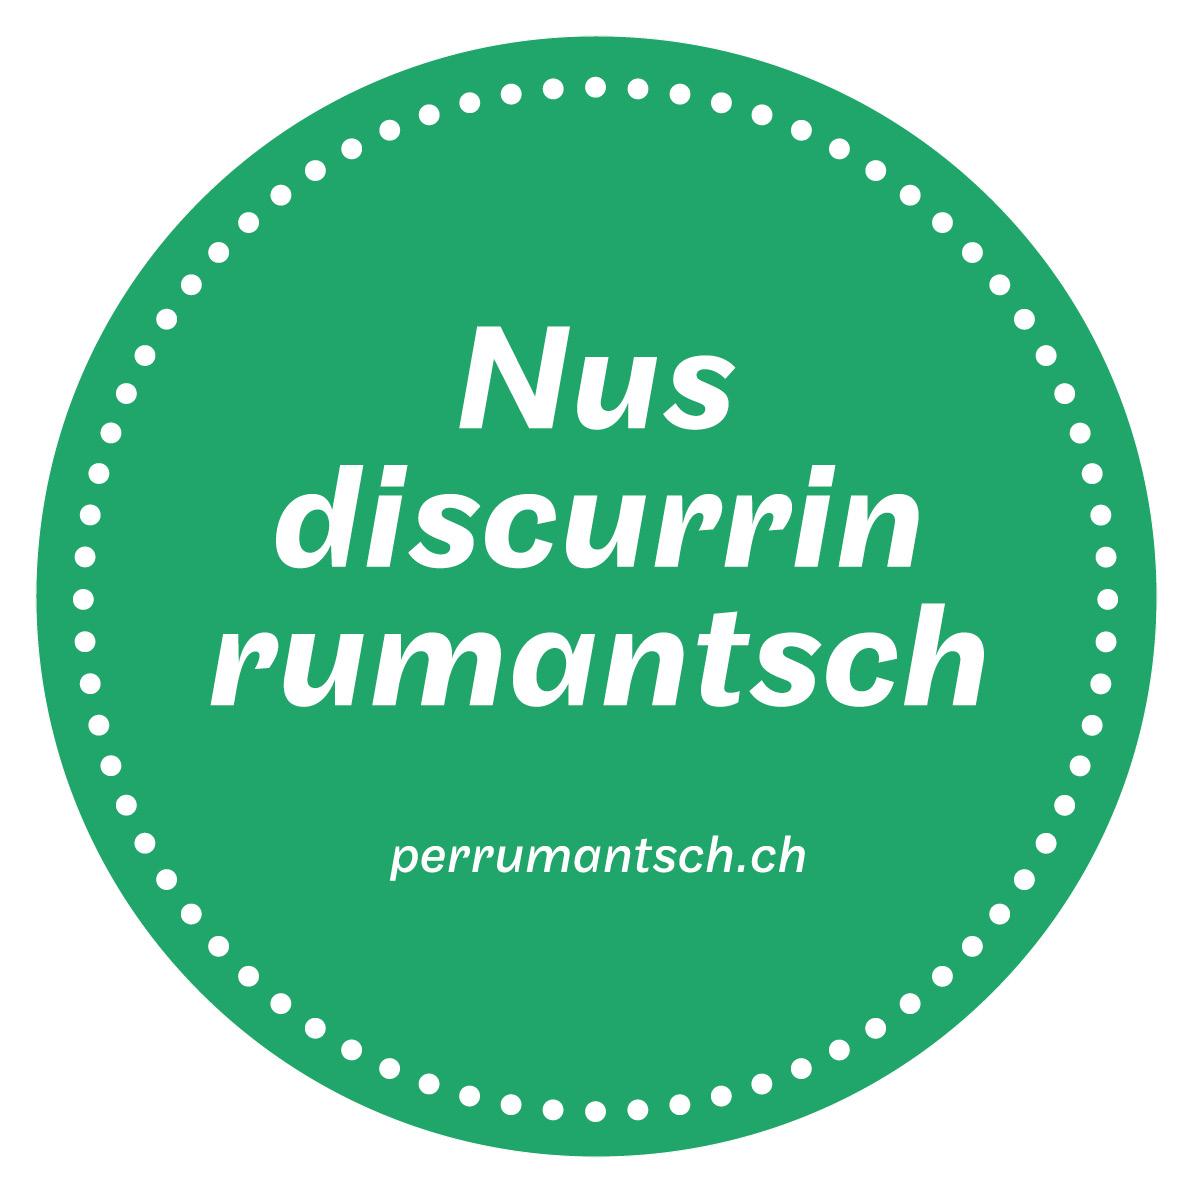 Nus discurrin Rumantsch